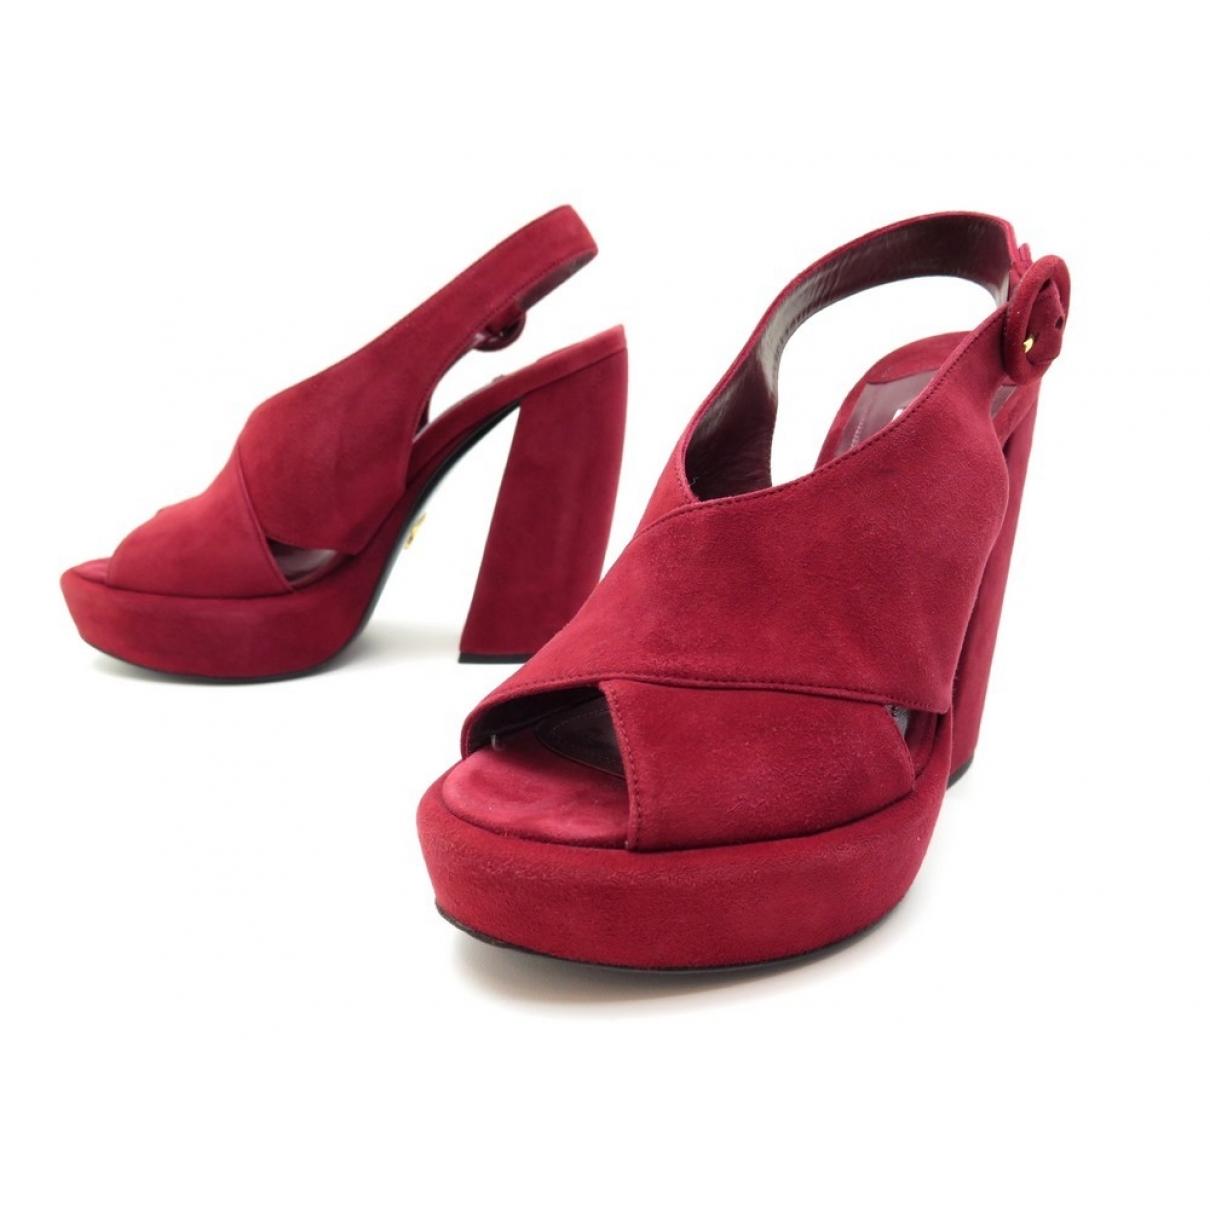 Prada \N Red Suede Sandals for Women 37 IT